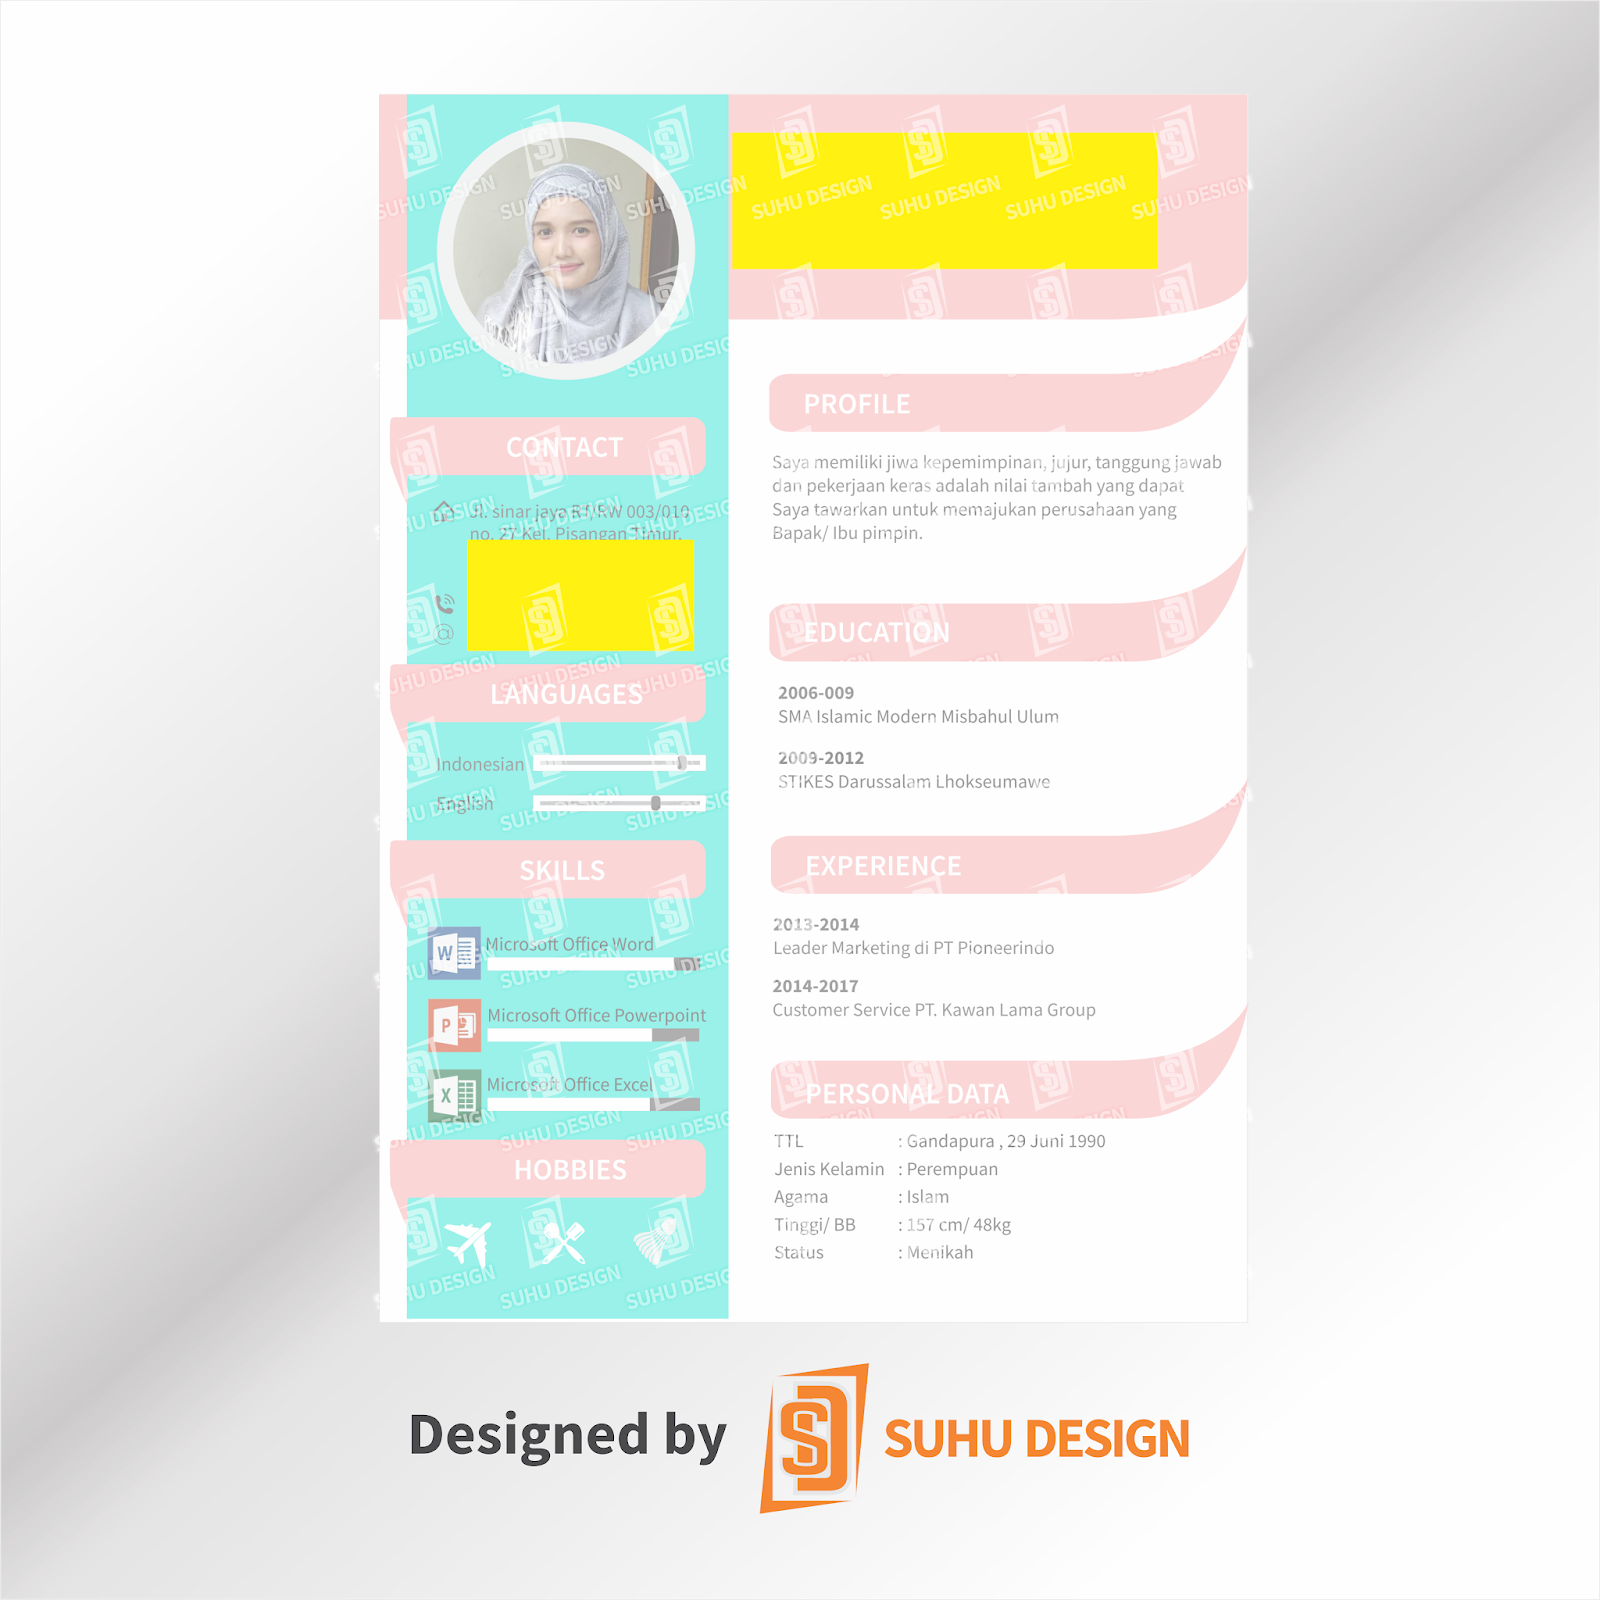 Hasil Desain Cv Suhu Design Bikincvindo 0003 Suhu Design Jasa